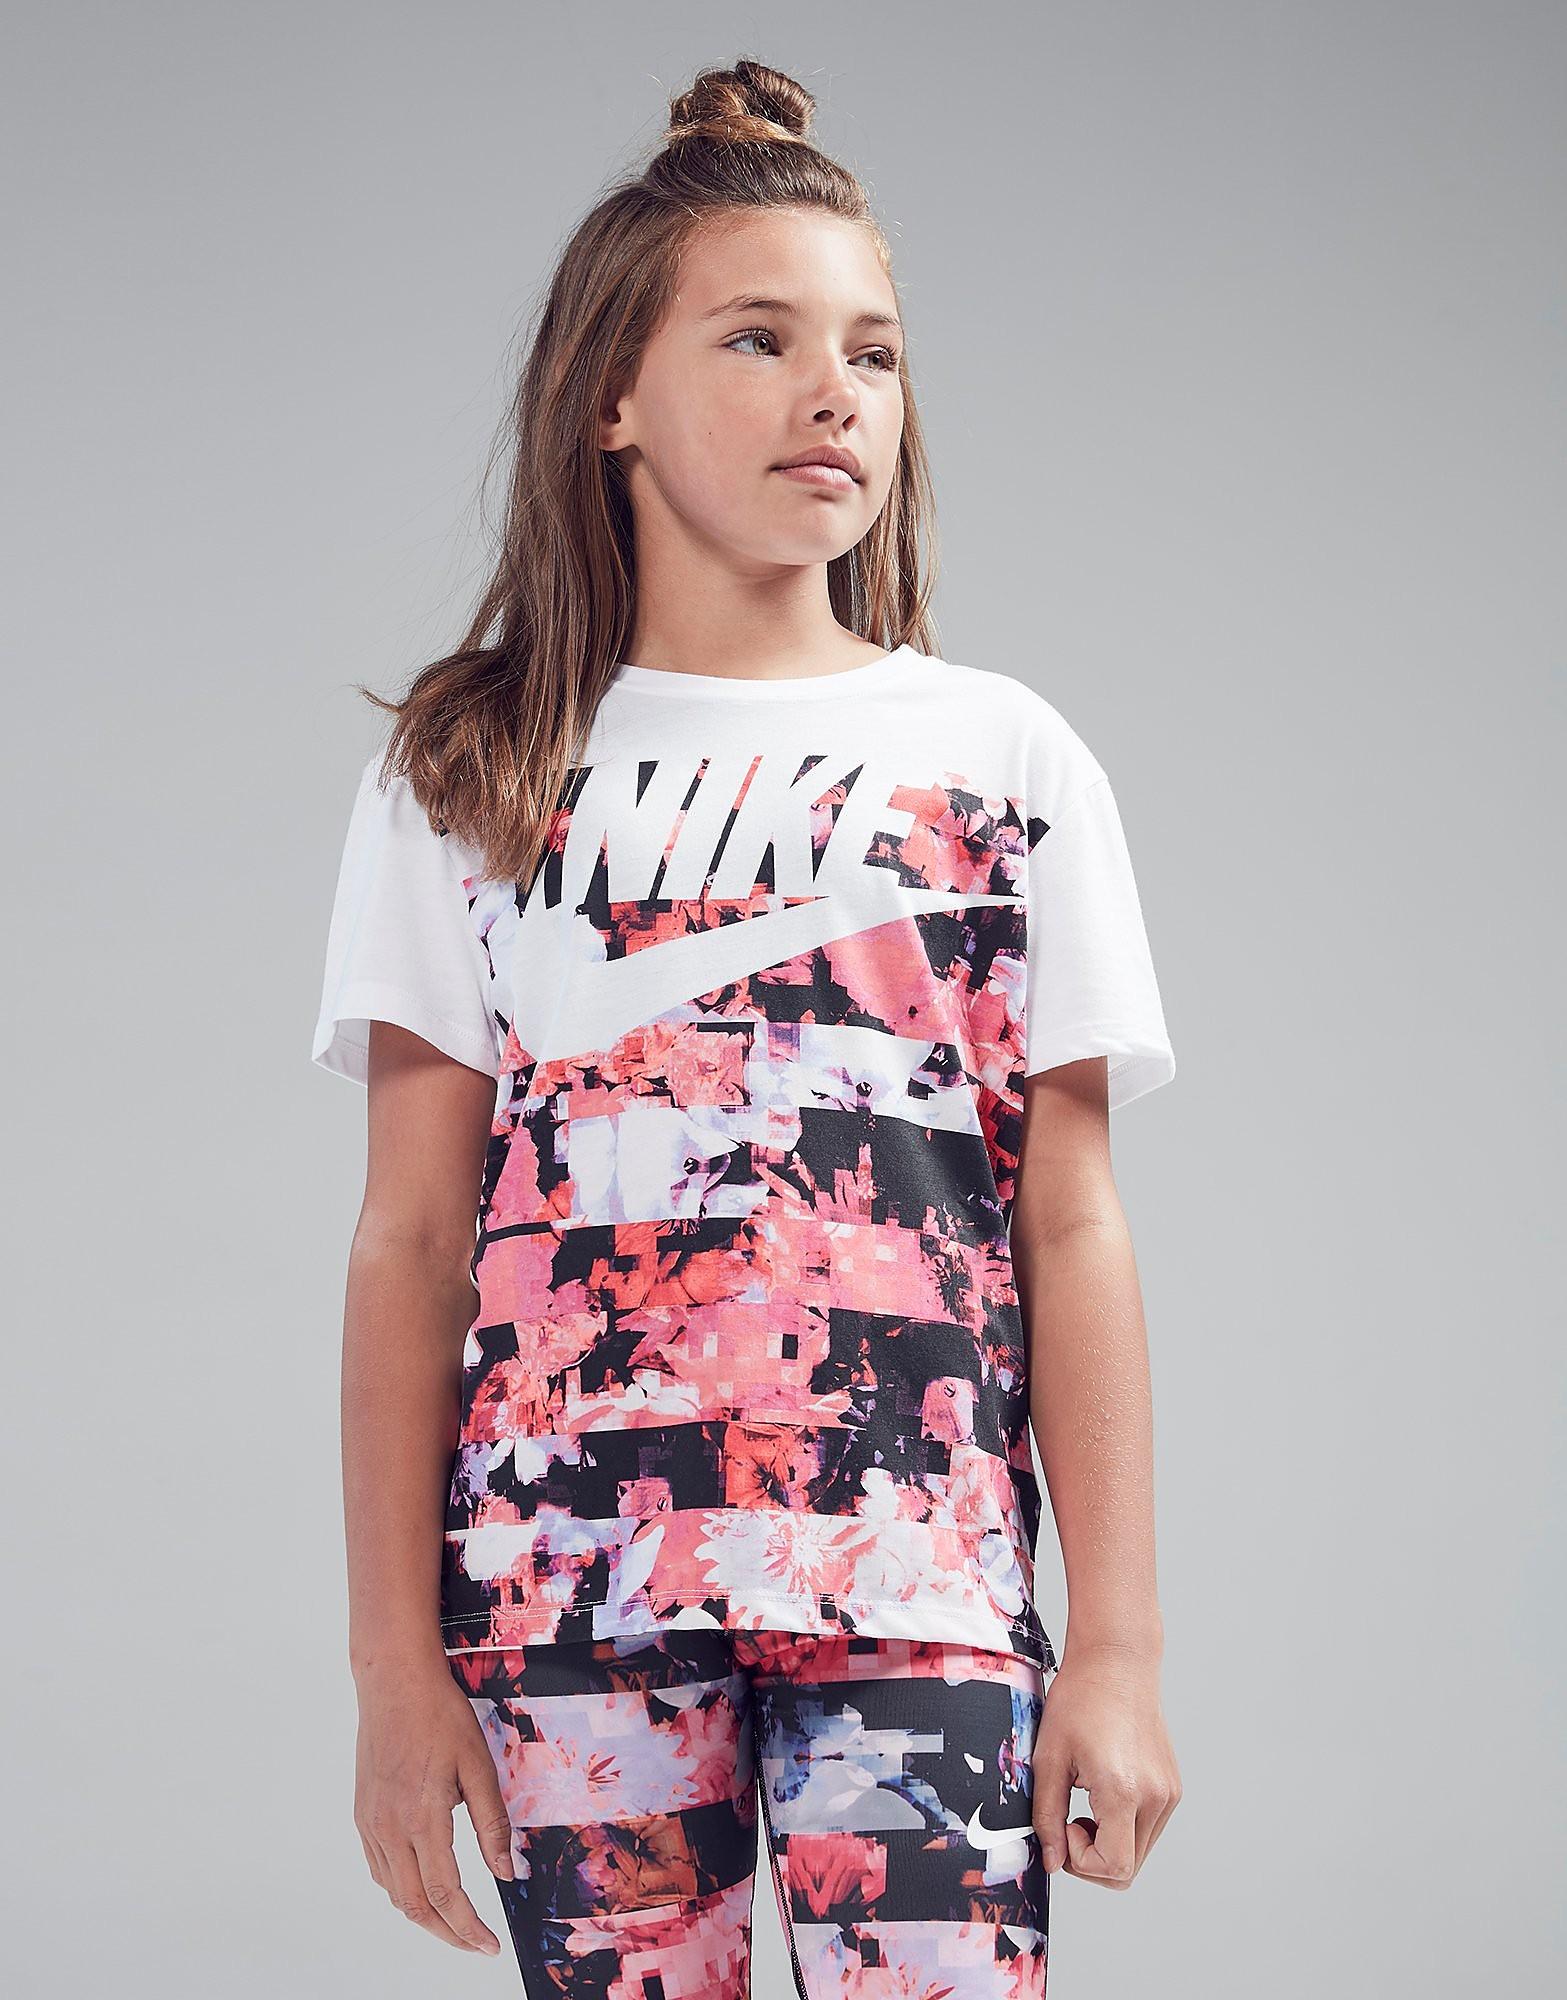 Nike camiseta Dry Flower júnior